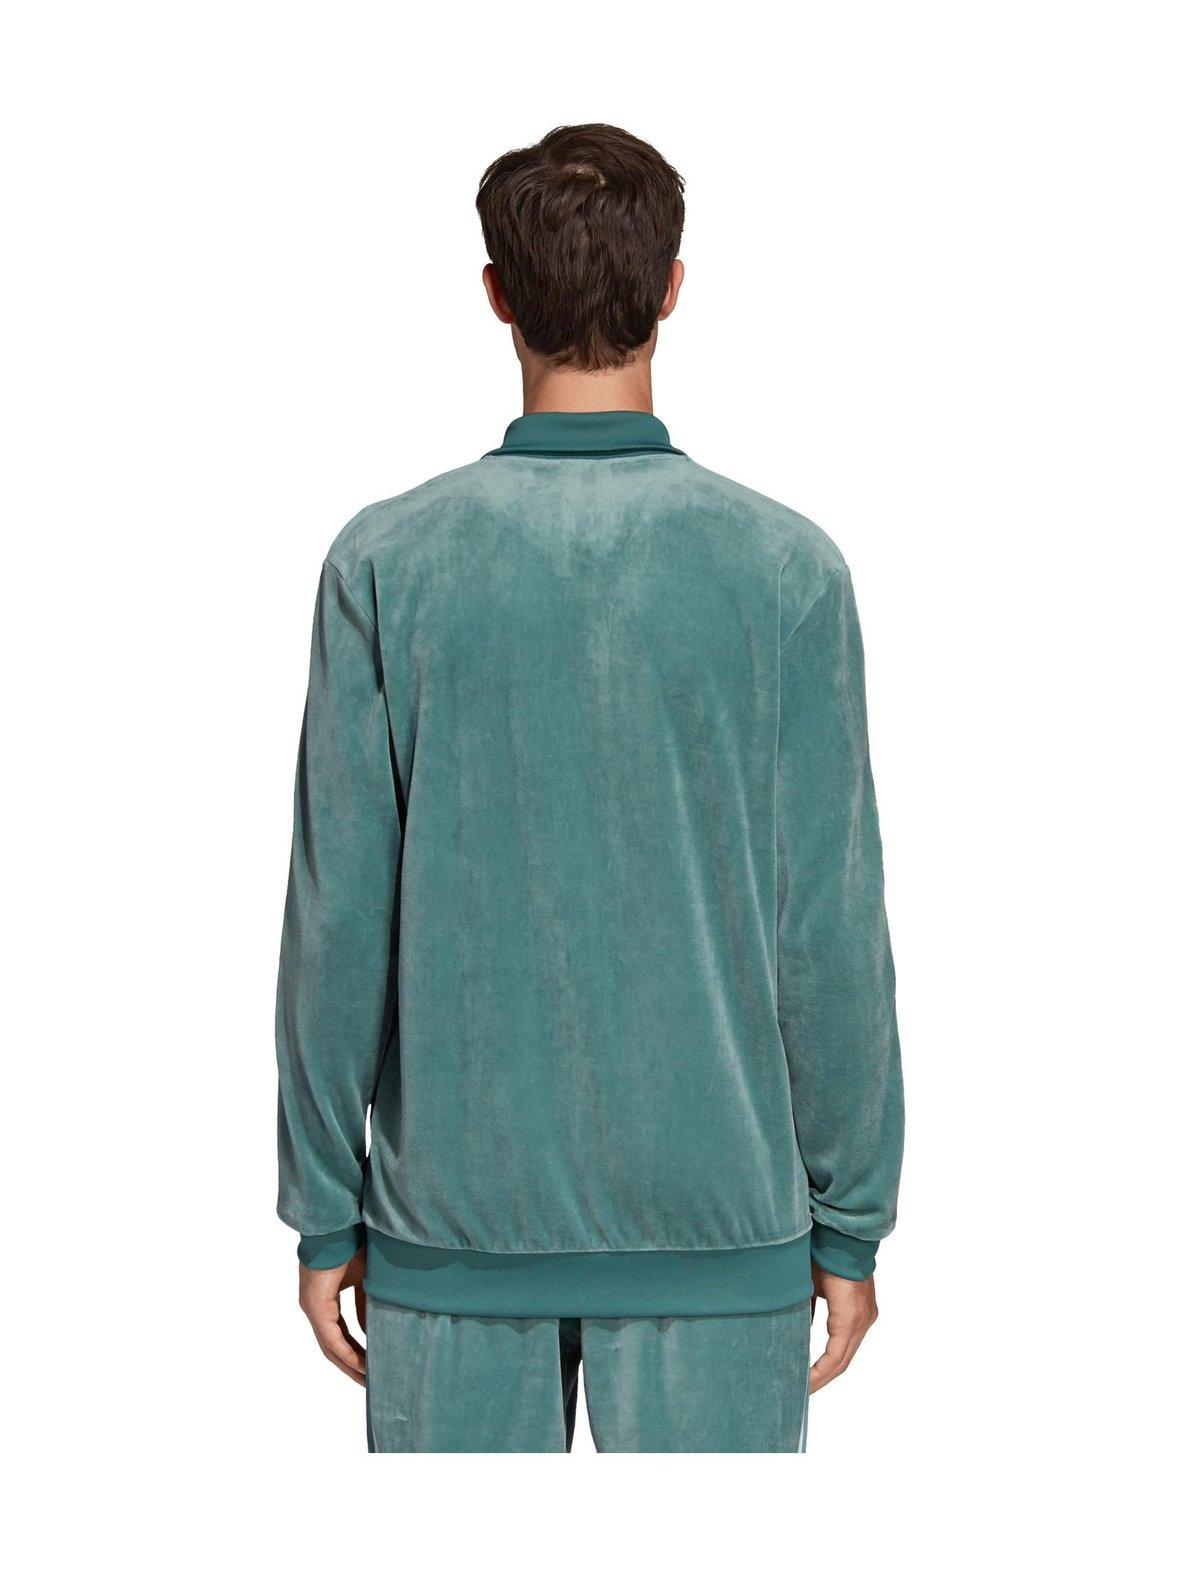 Vapour Steel Adidas Originals Cozy Track Jacket -takki  ead8b3b1d1